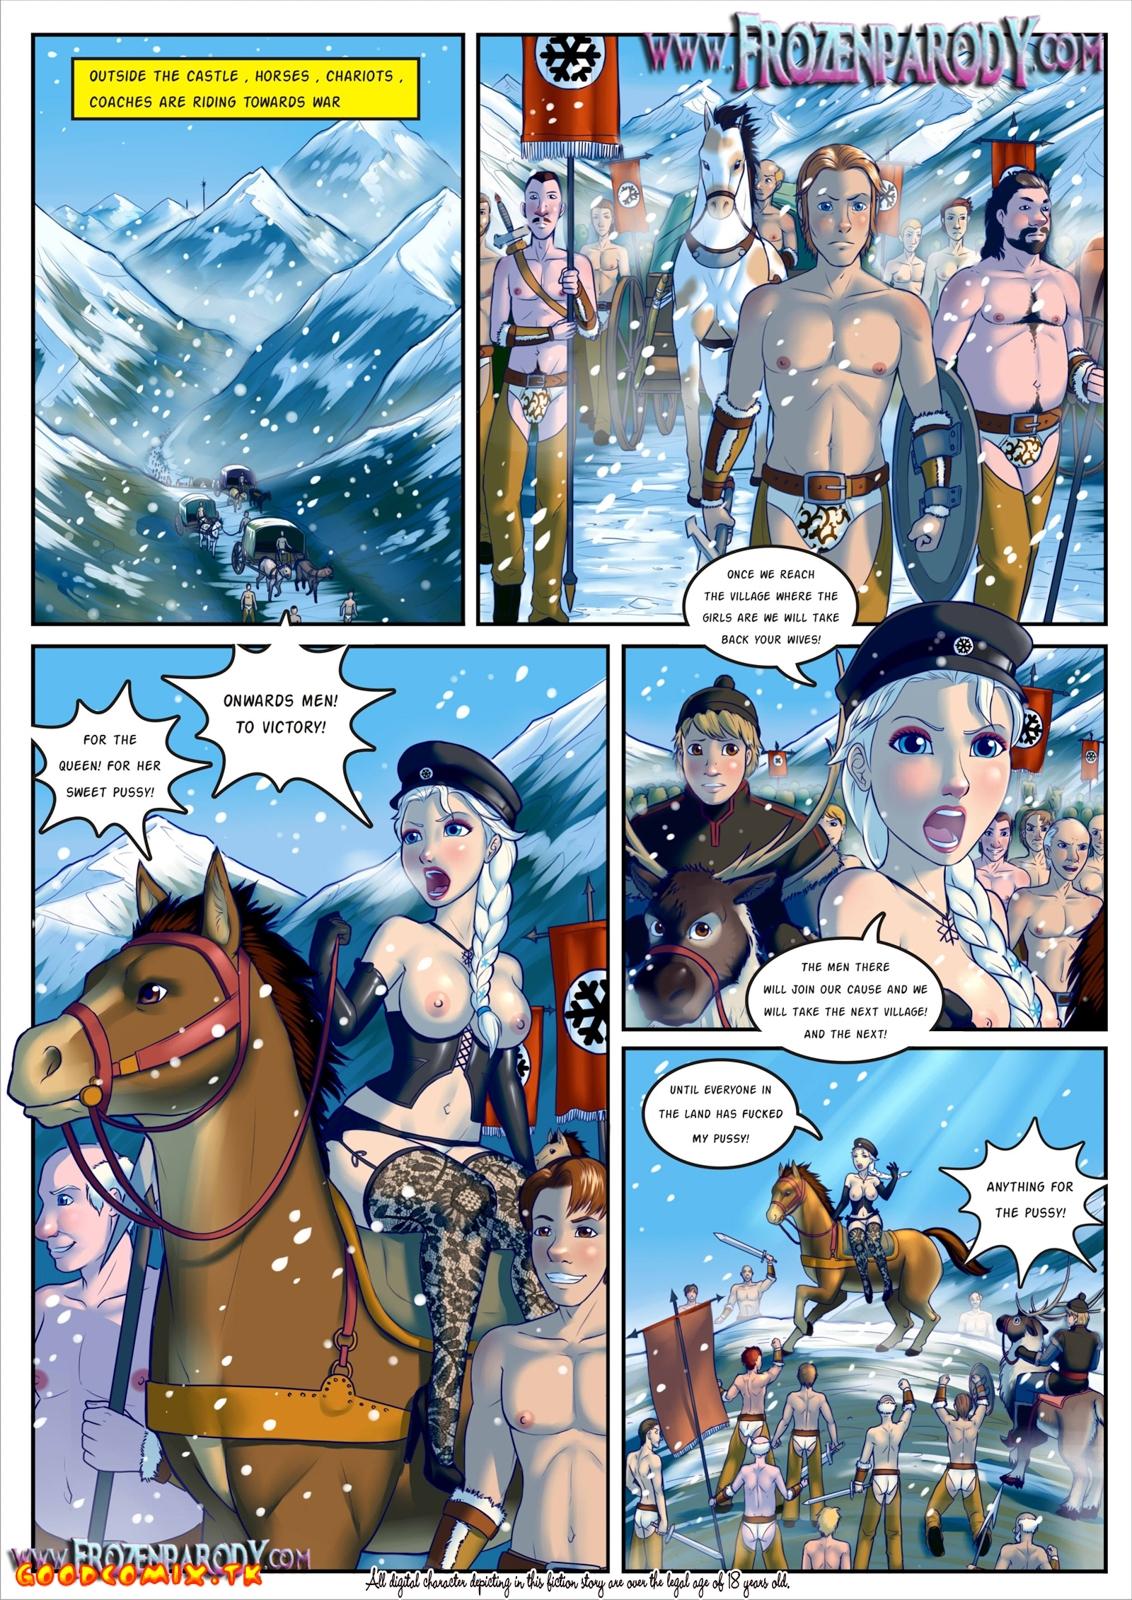 Goodcomix.tk Frozen - [Grimphantom][FrozenParody] - Frozen Parody - Part 2 - Anna